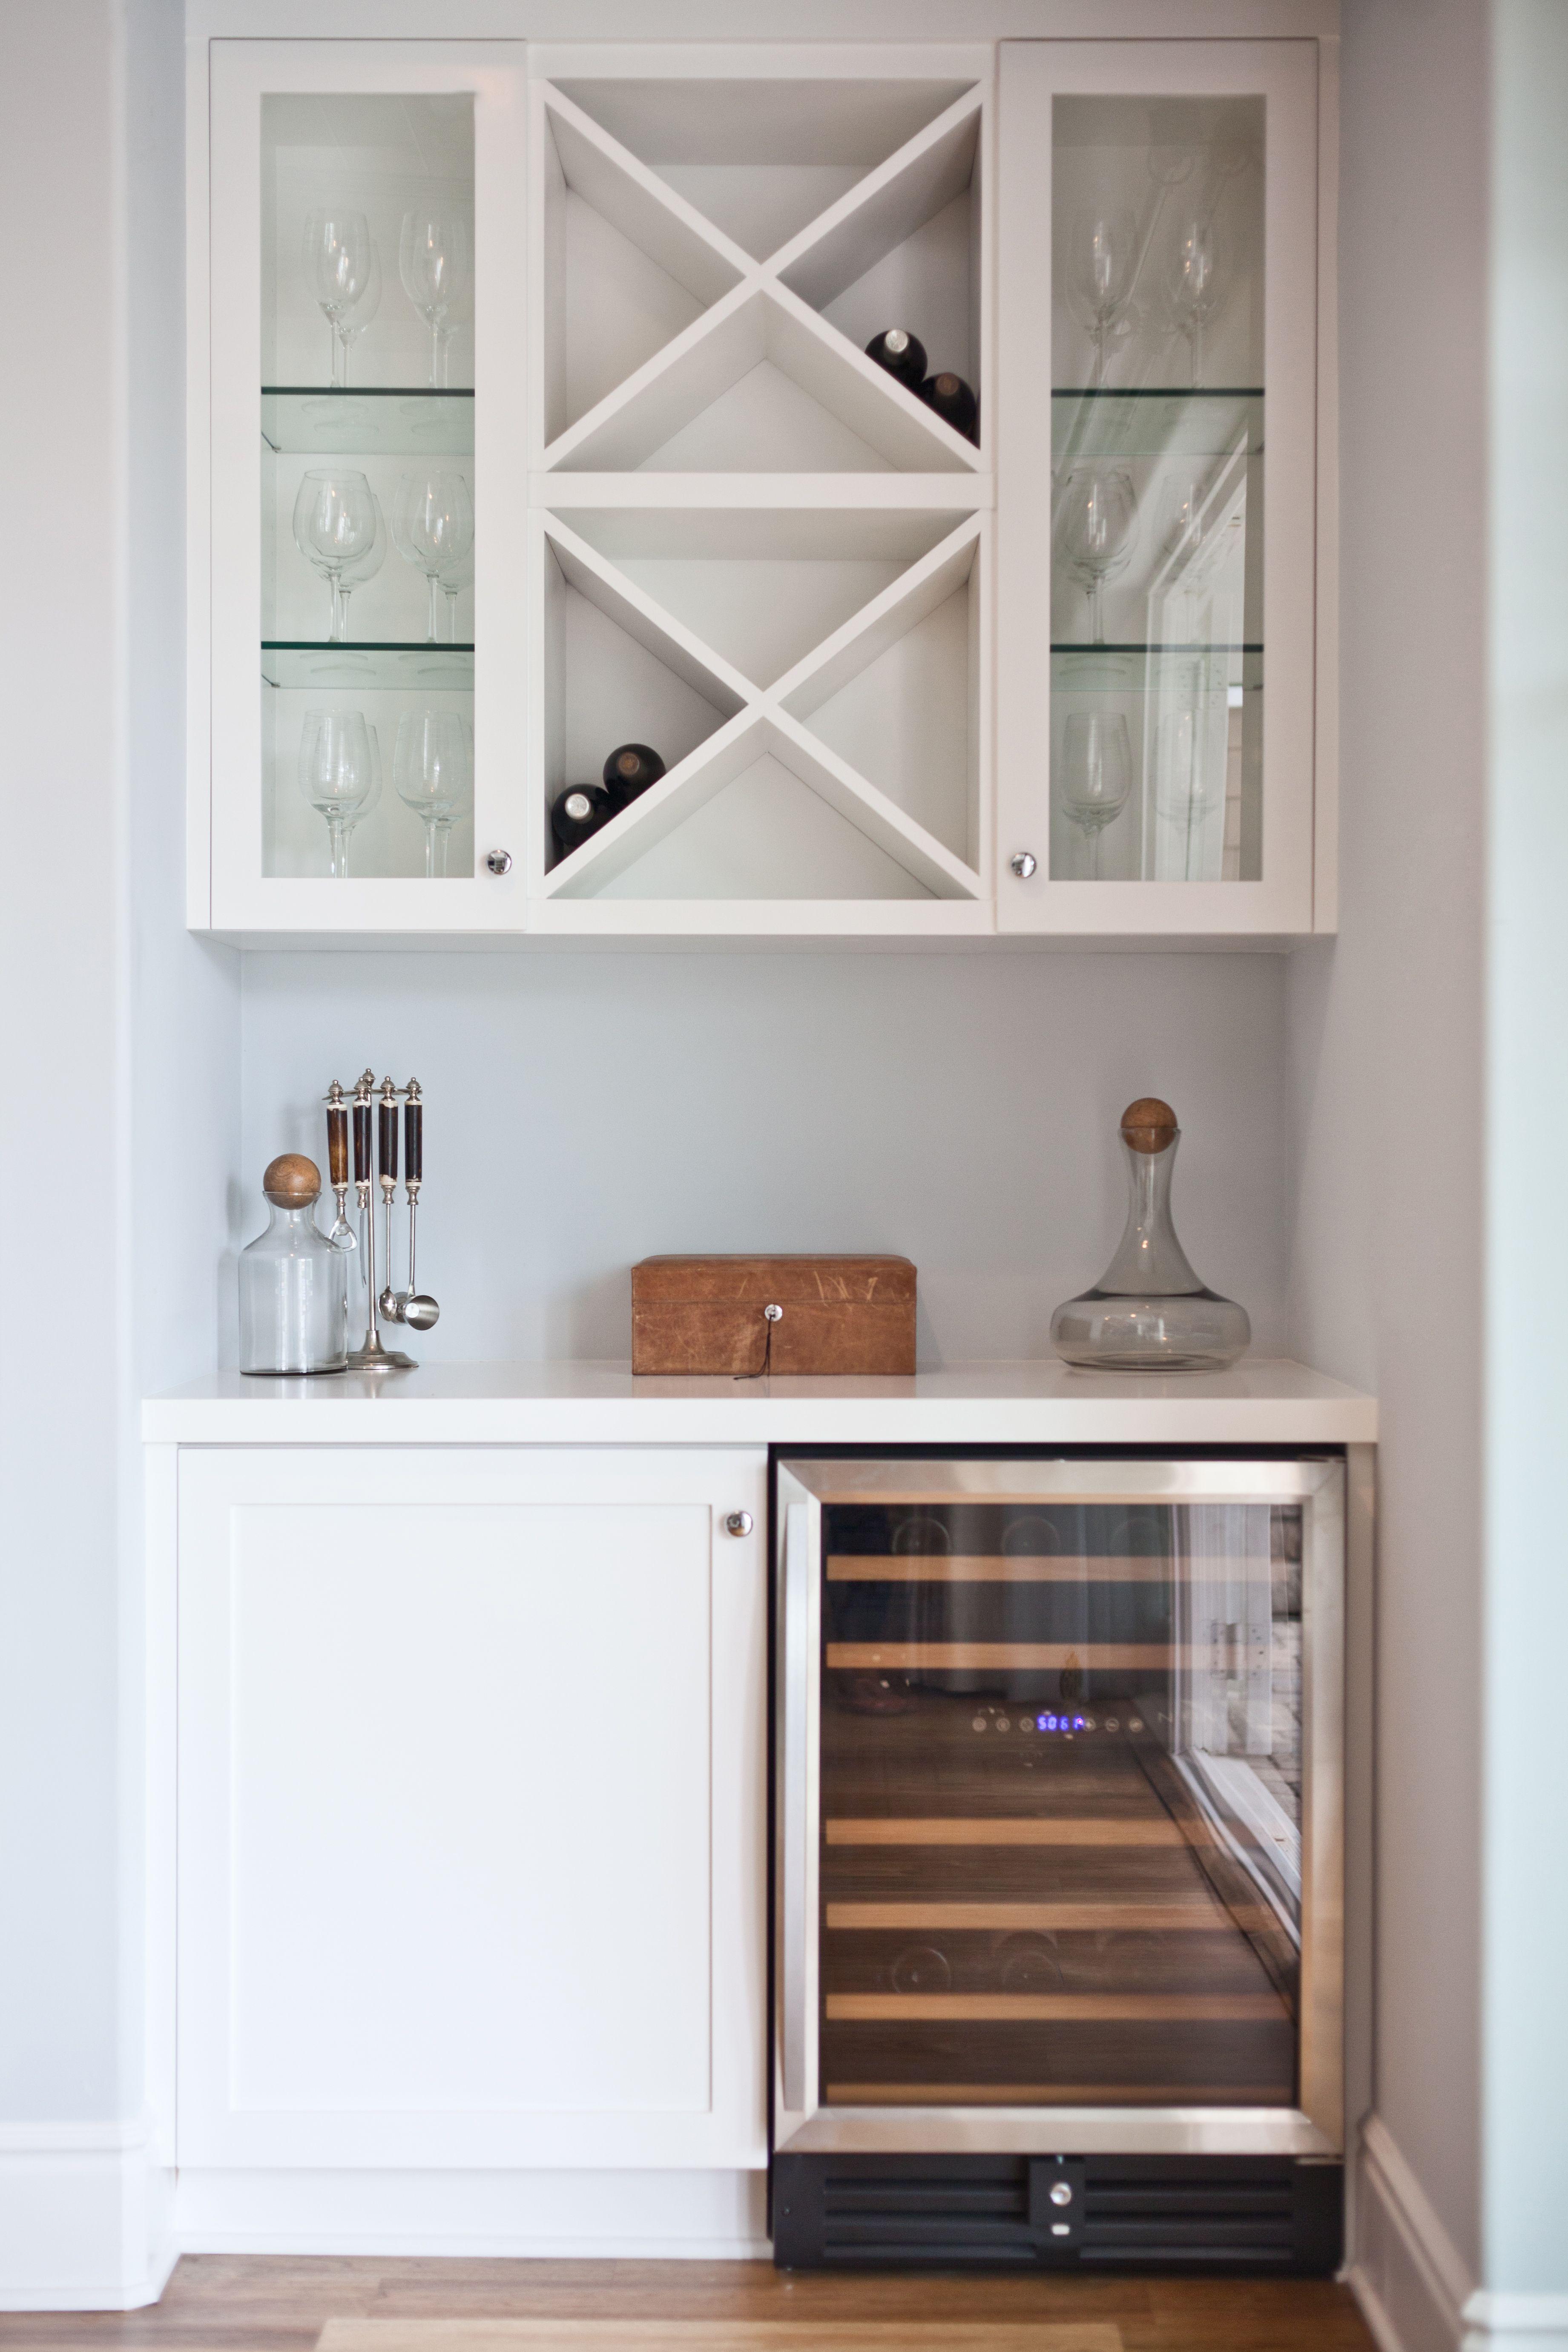 Lindye Galloway Design Lovely lil minibar station with bat fridge